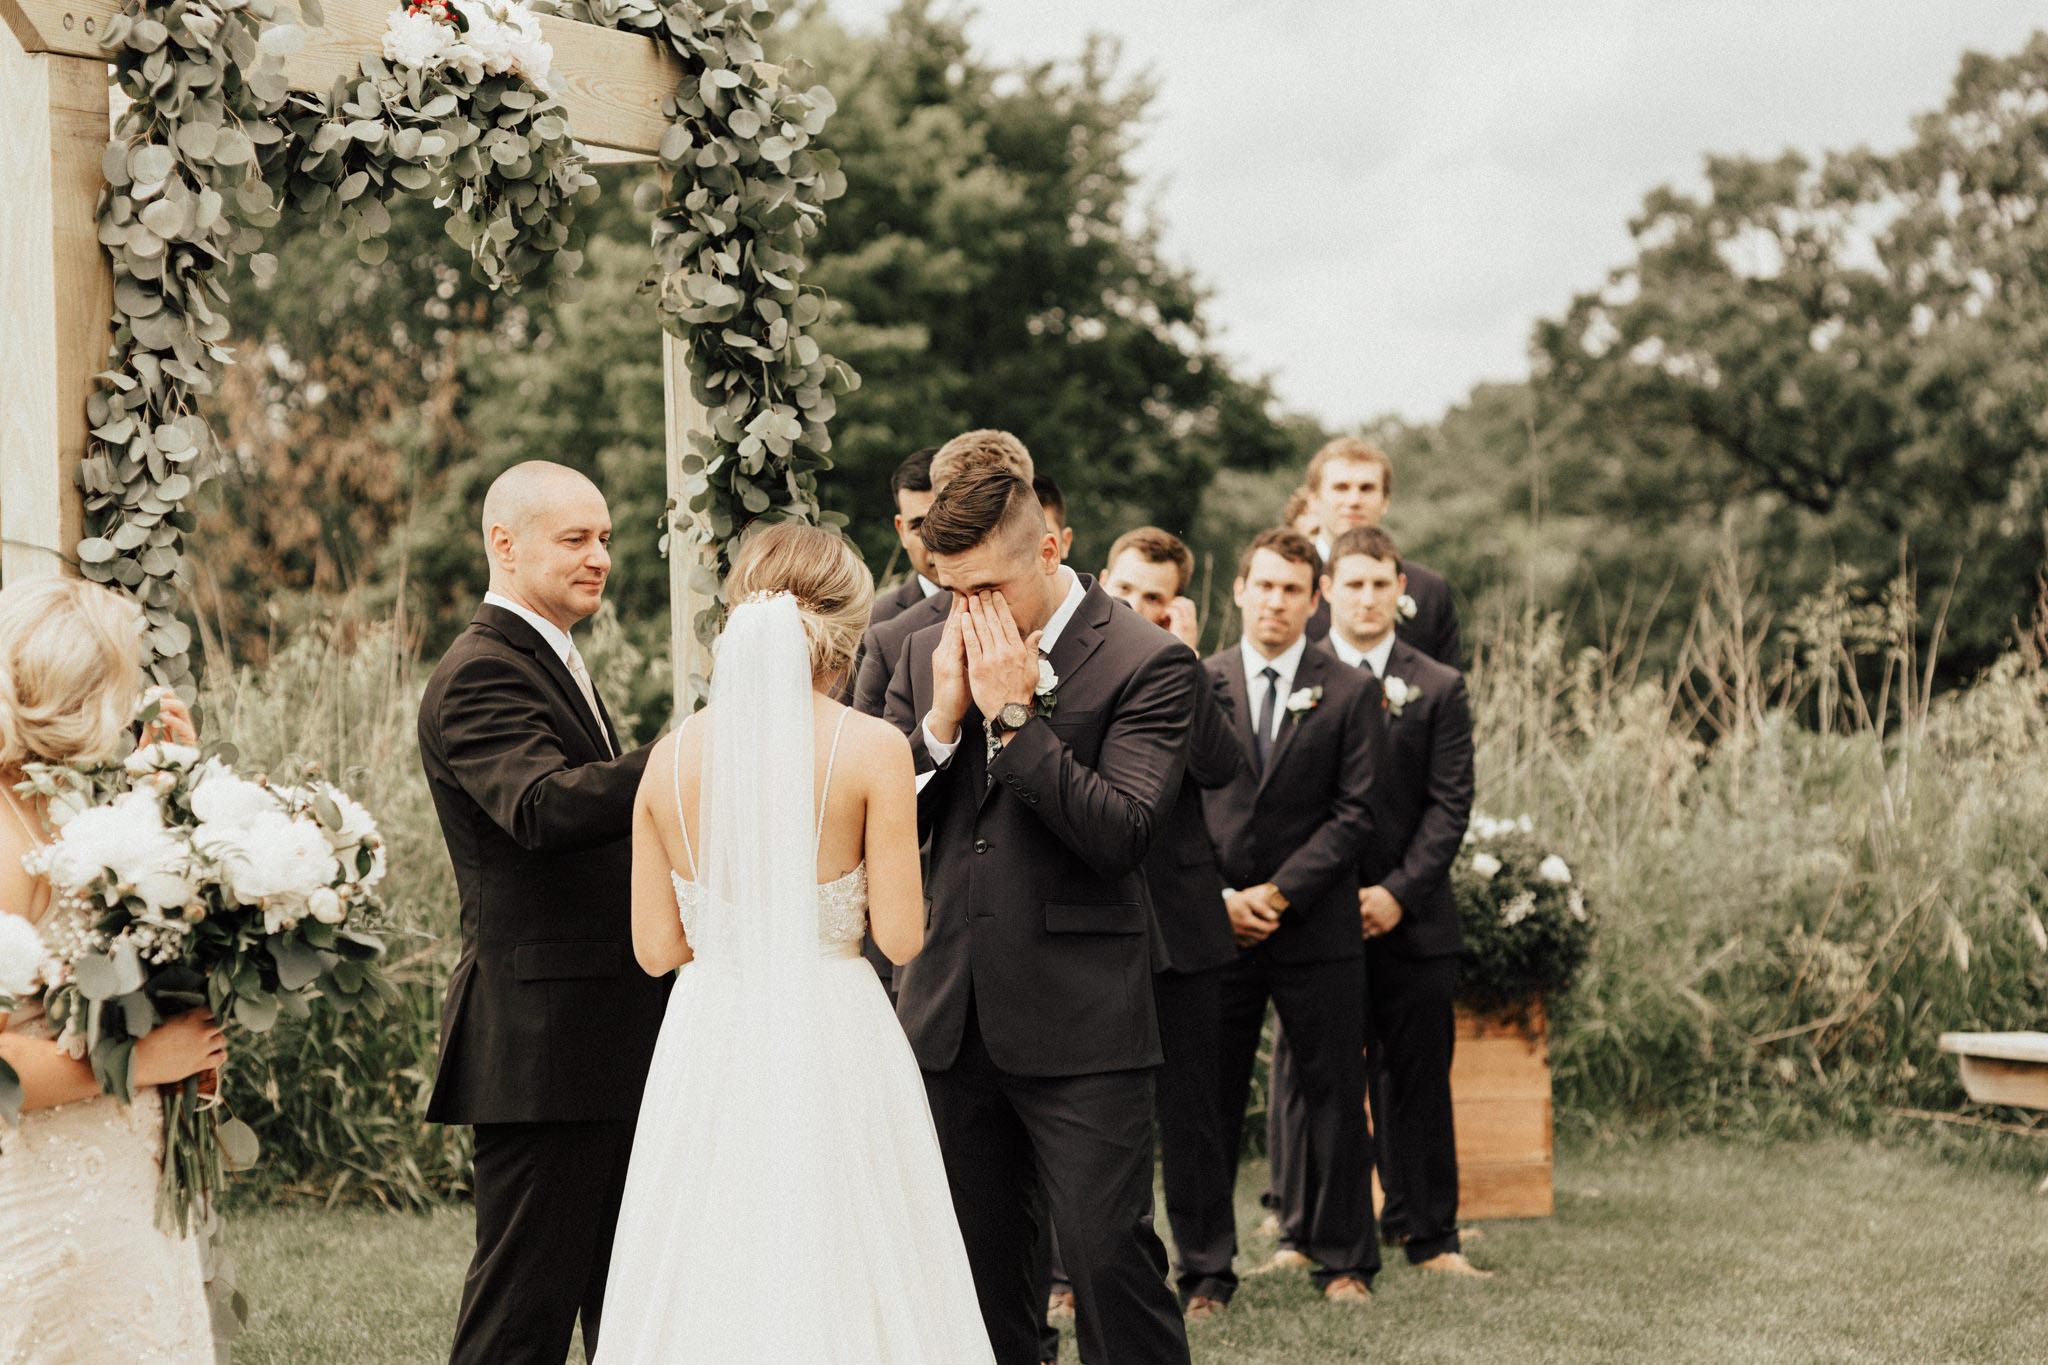 Arizona-Adventure-Elopement-Wedding-Photographer-88.jpg